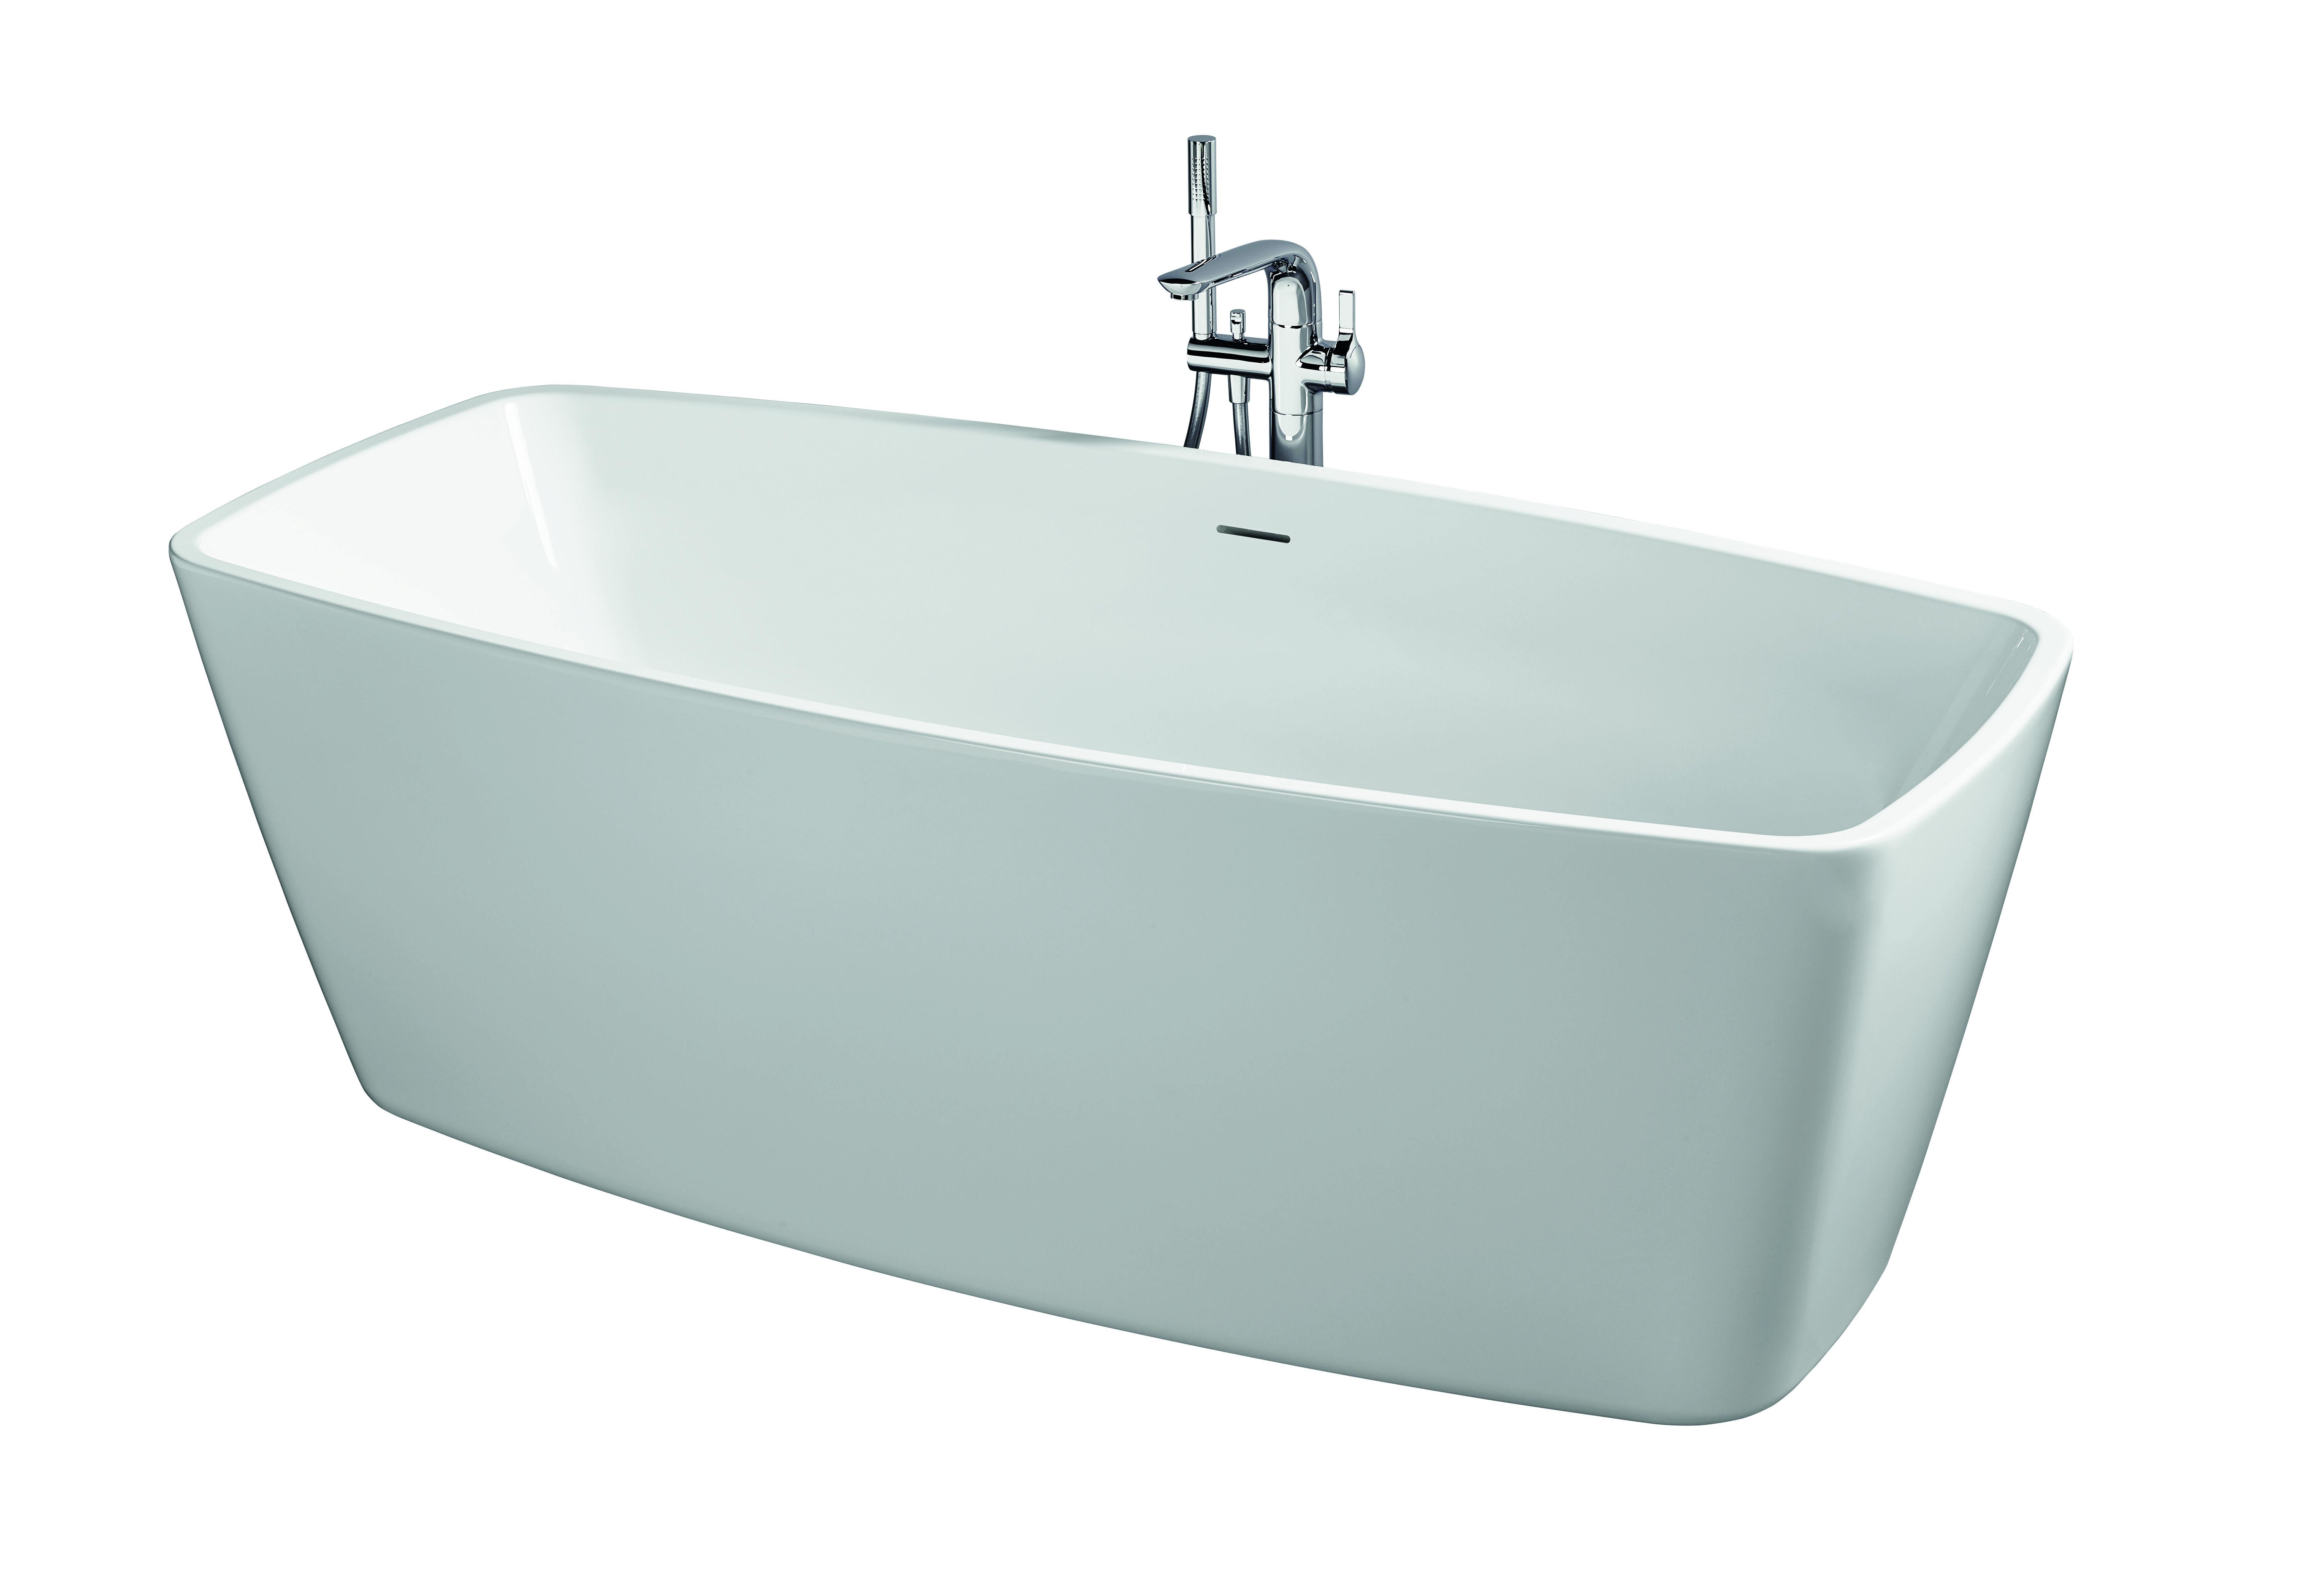 Crostolo freestanding bath by Sottini. Crostolo has an elegantly ...